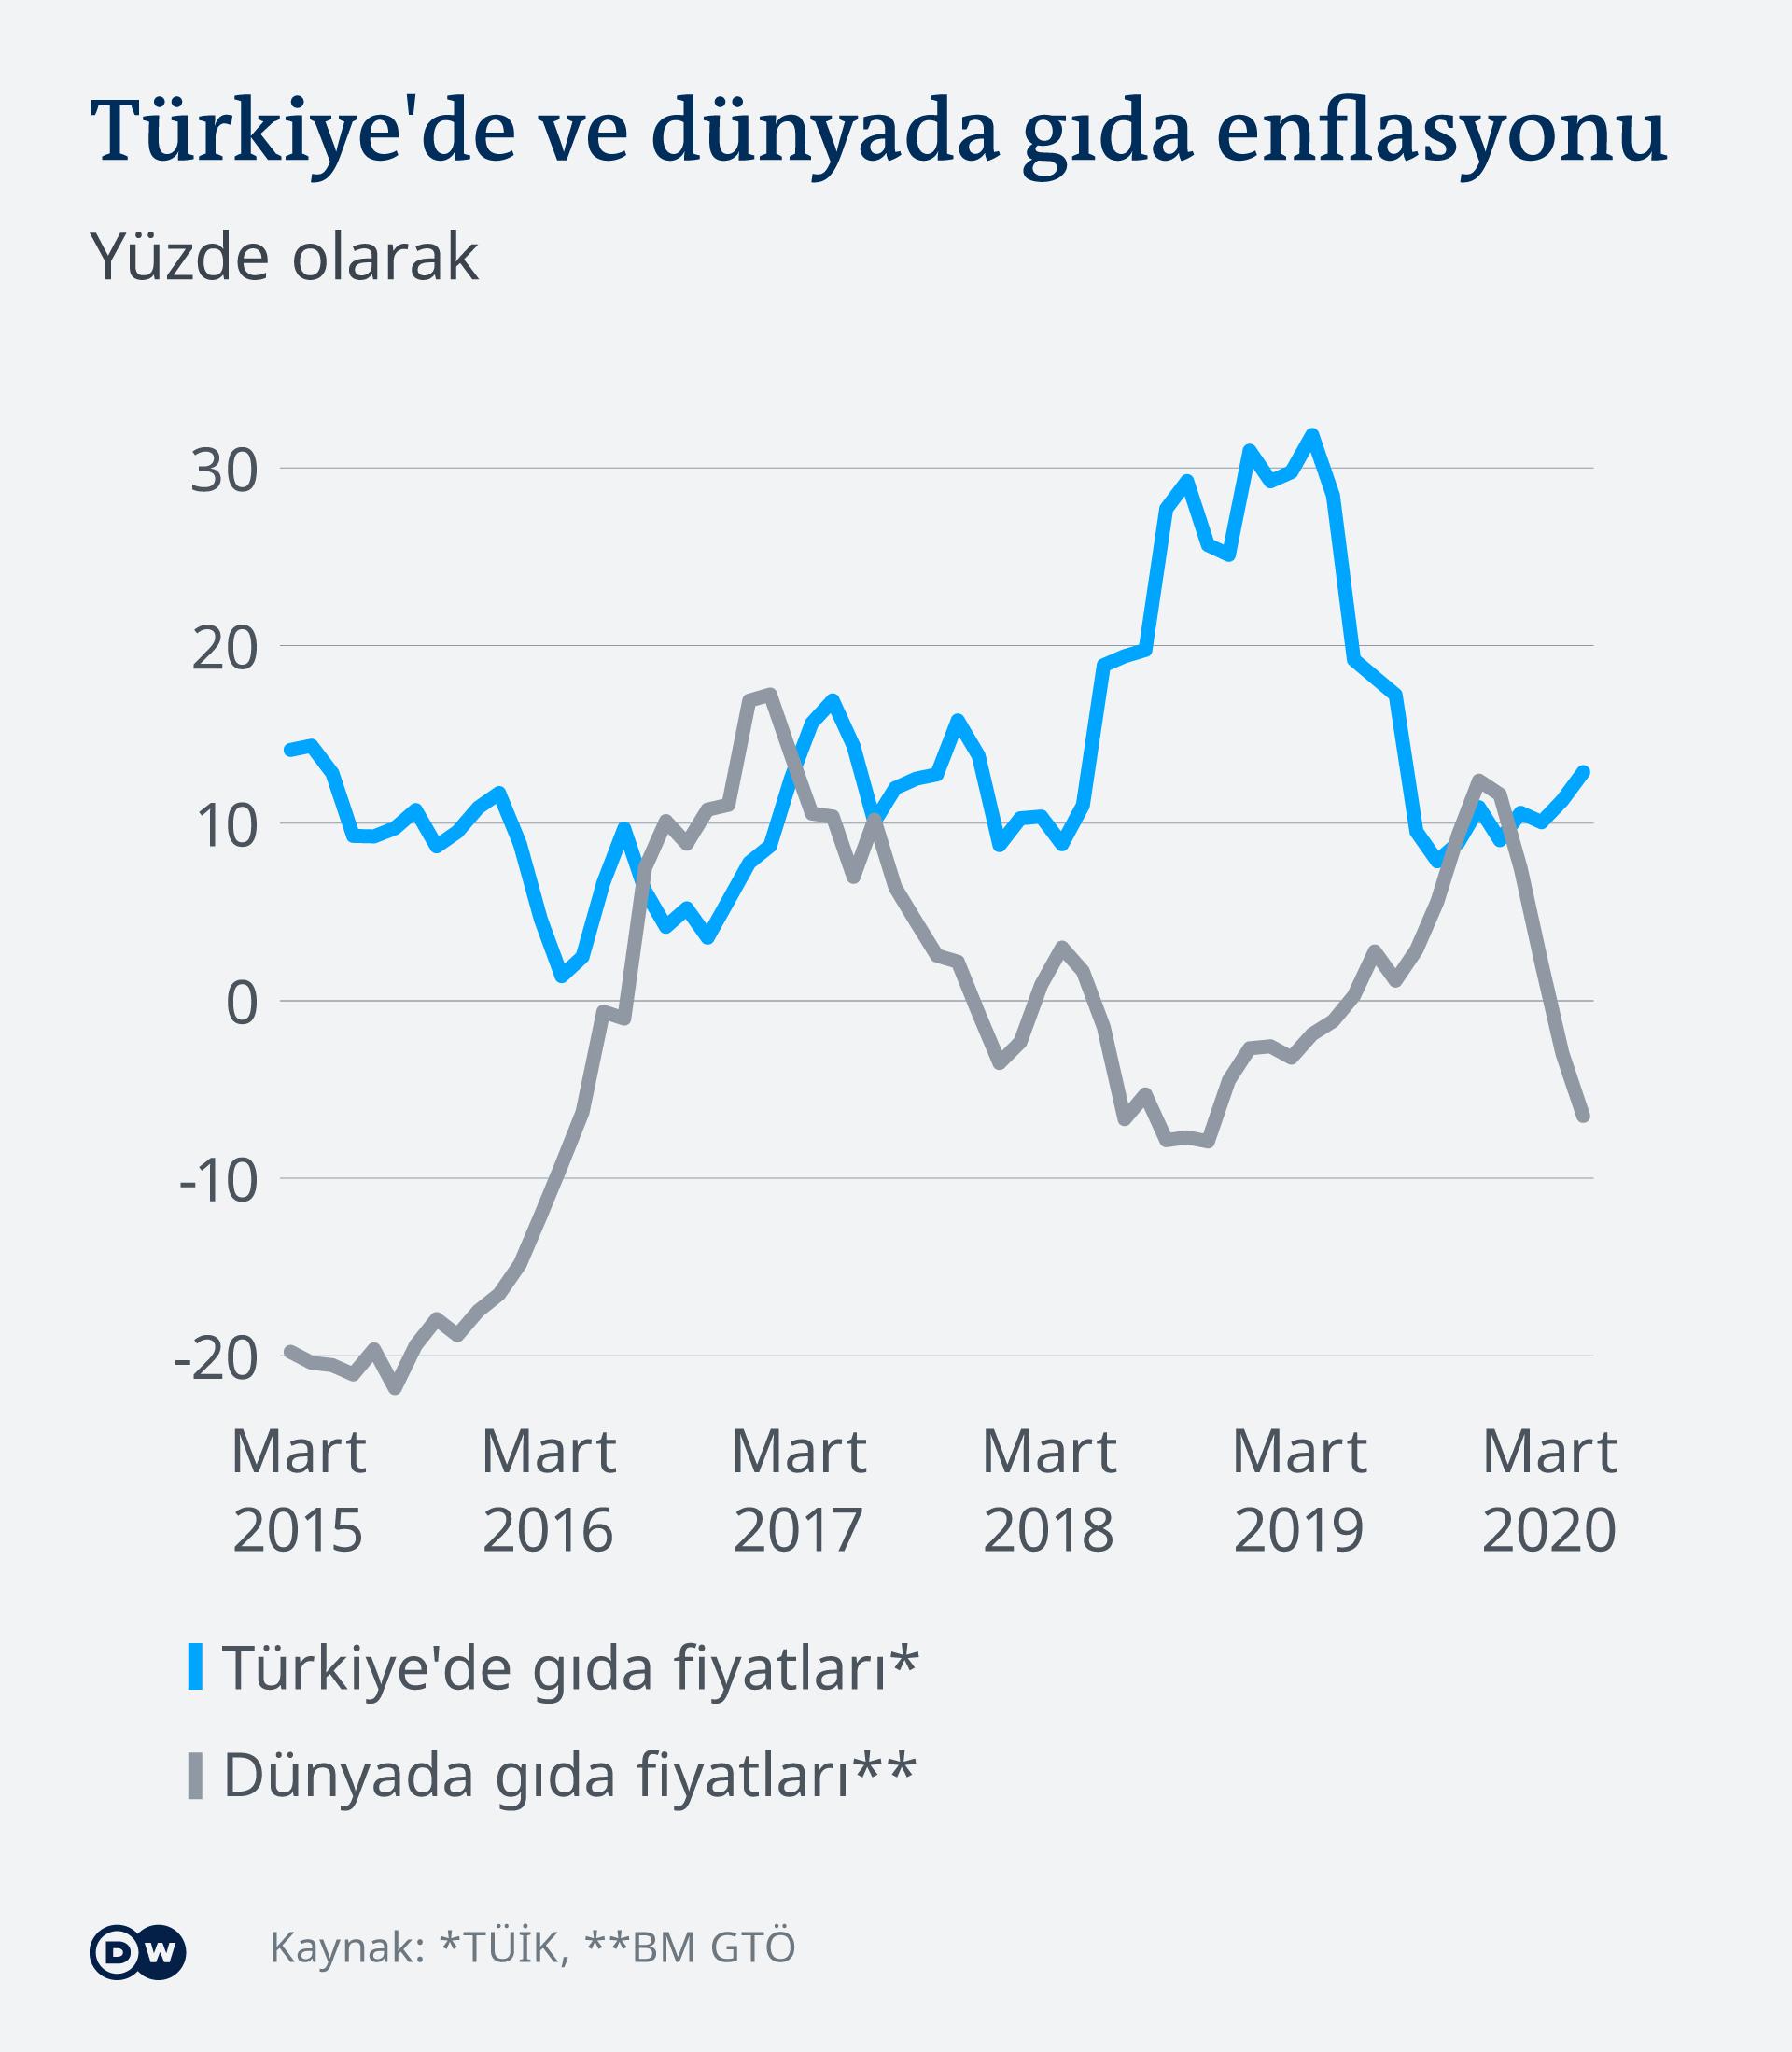 Infografik Lebensmittelpreise Vergleich Türkei, Welt TR